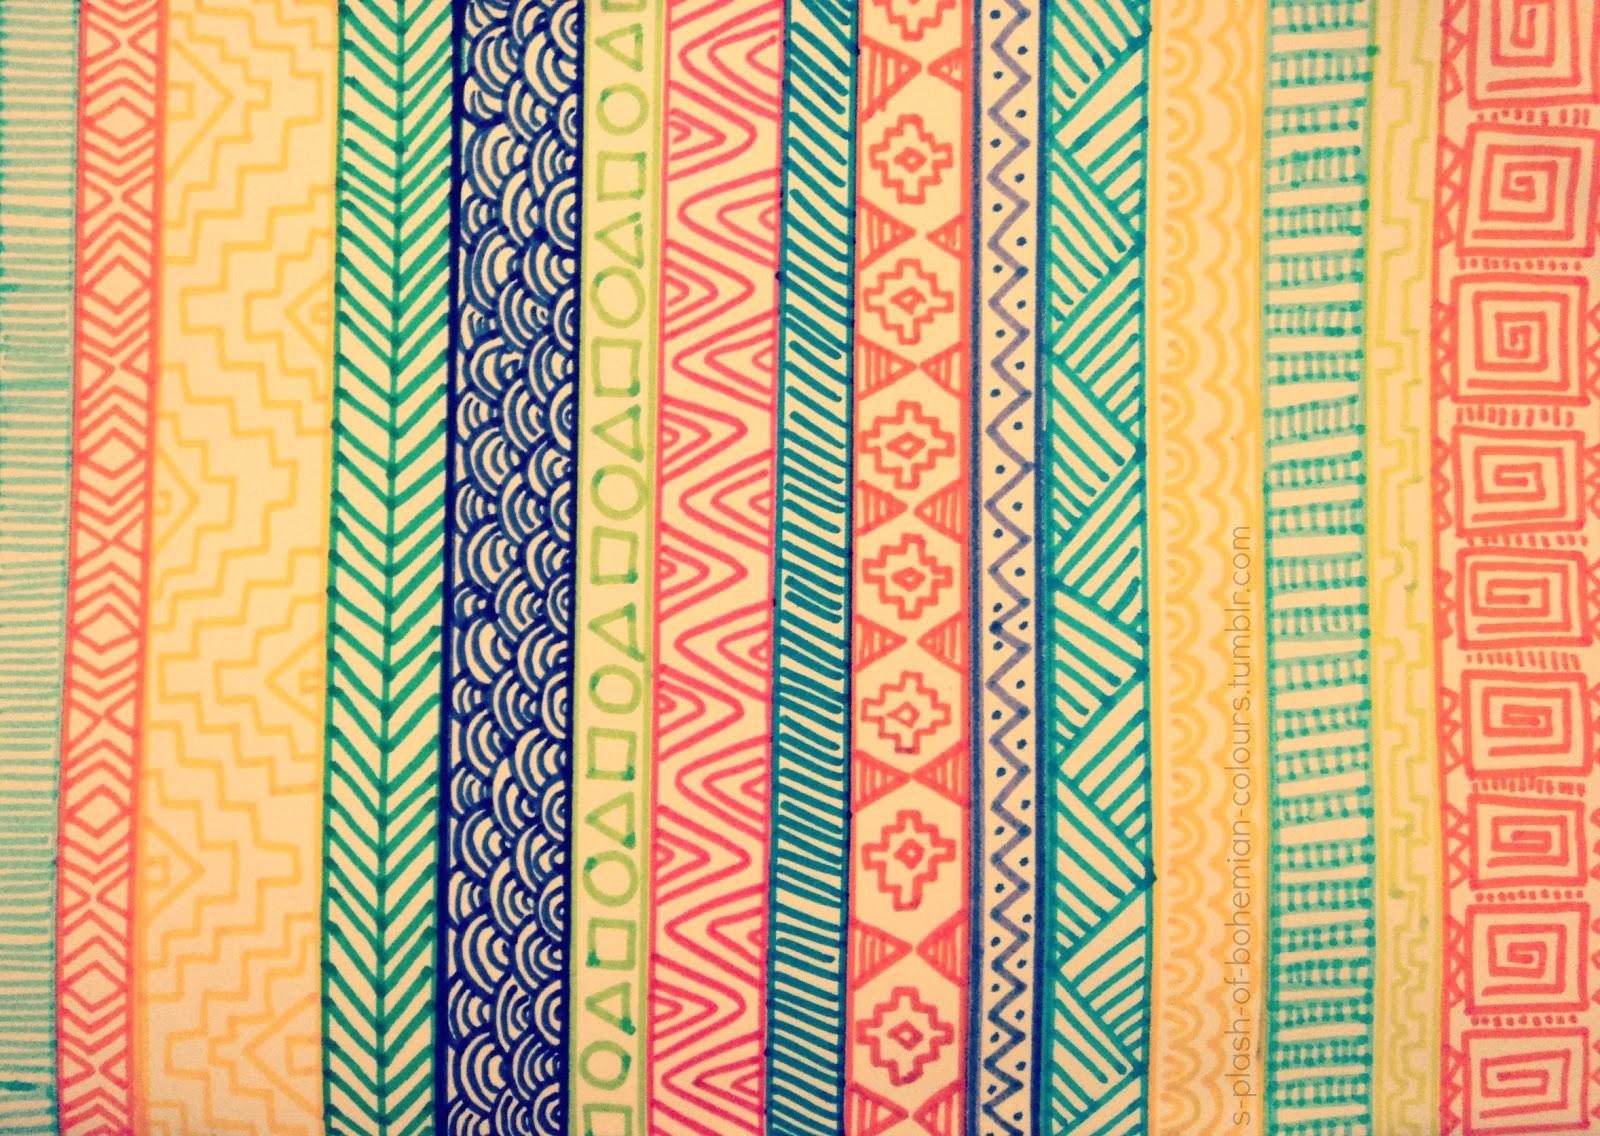 Tribal Backgrounds - WallpaperSafari - photo#32